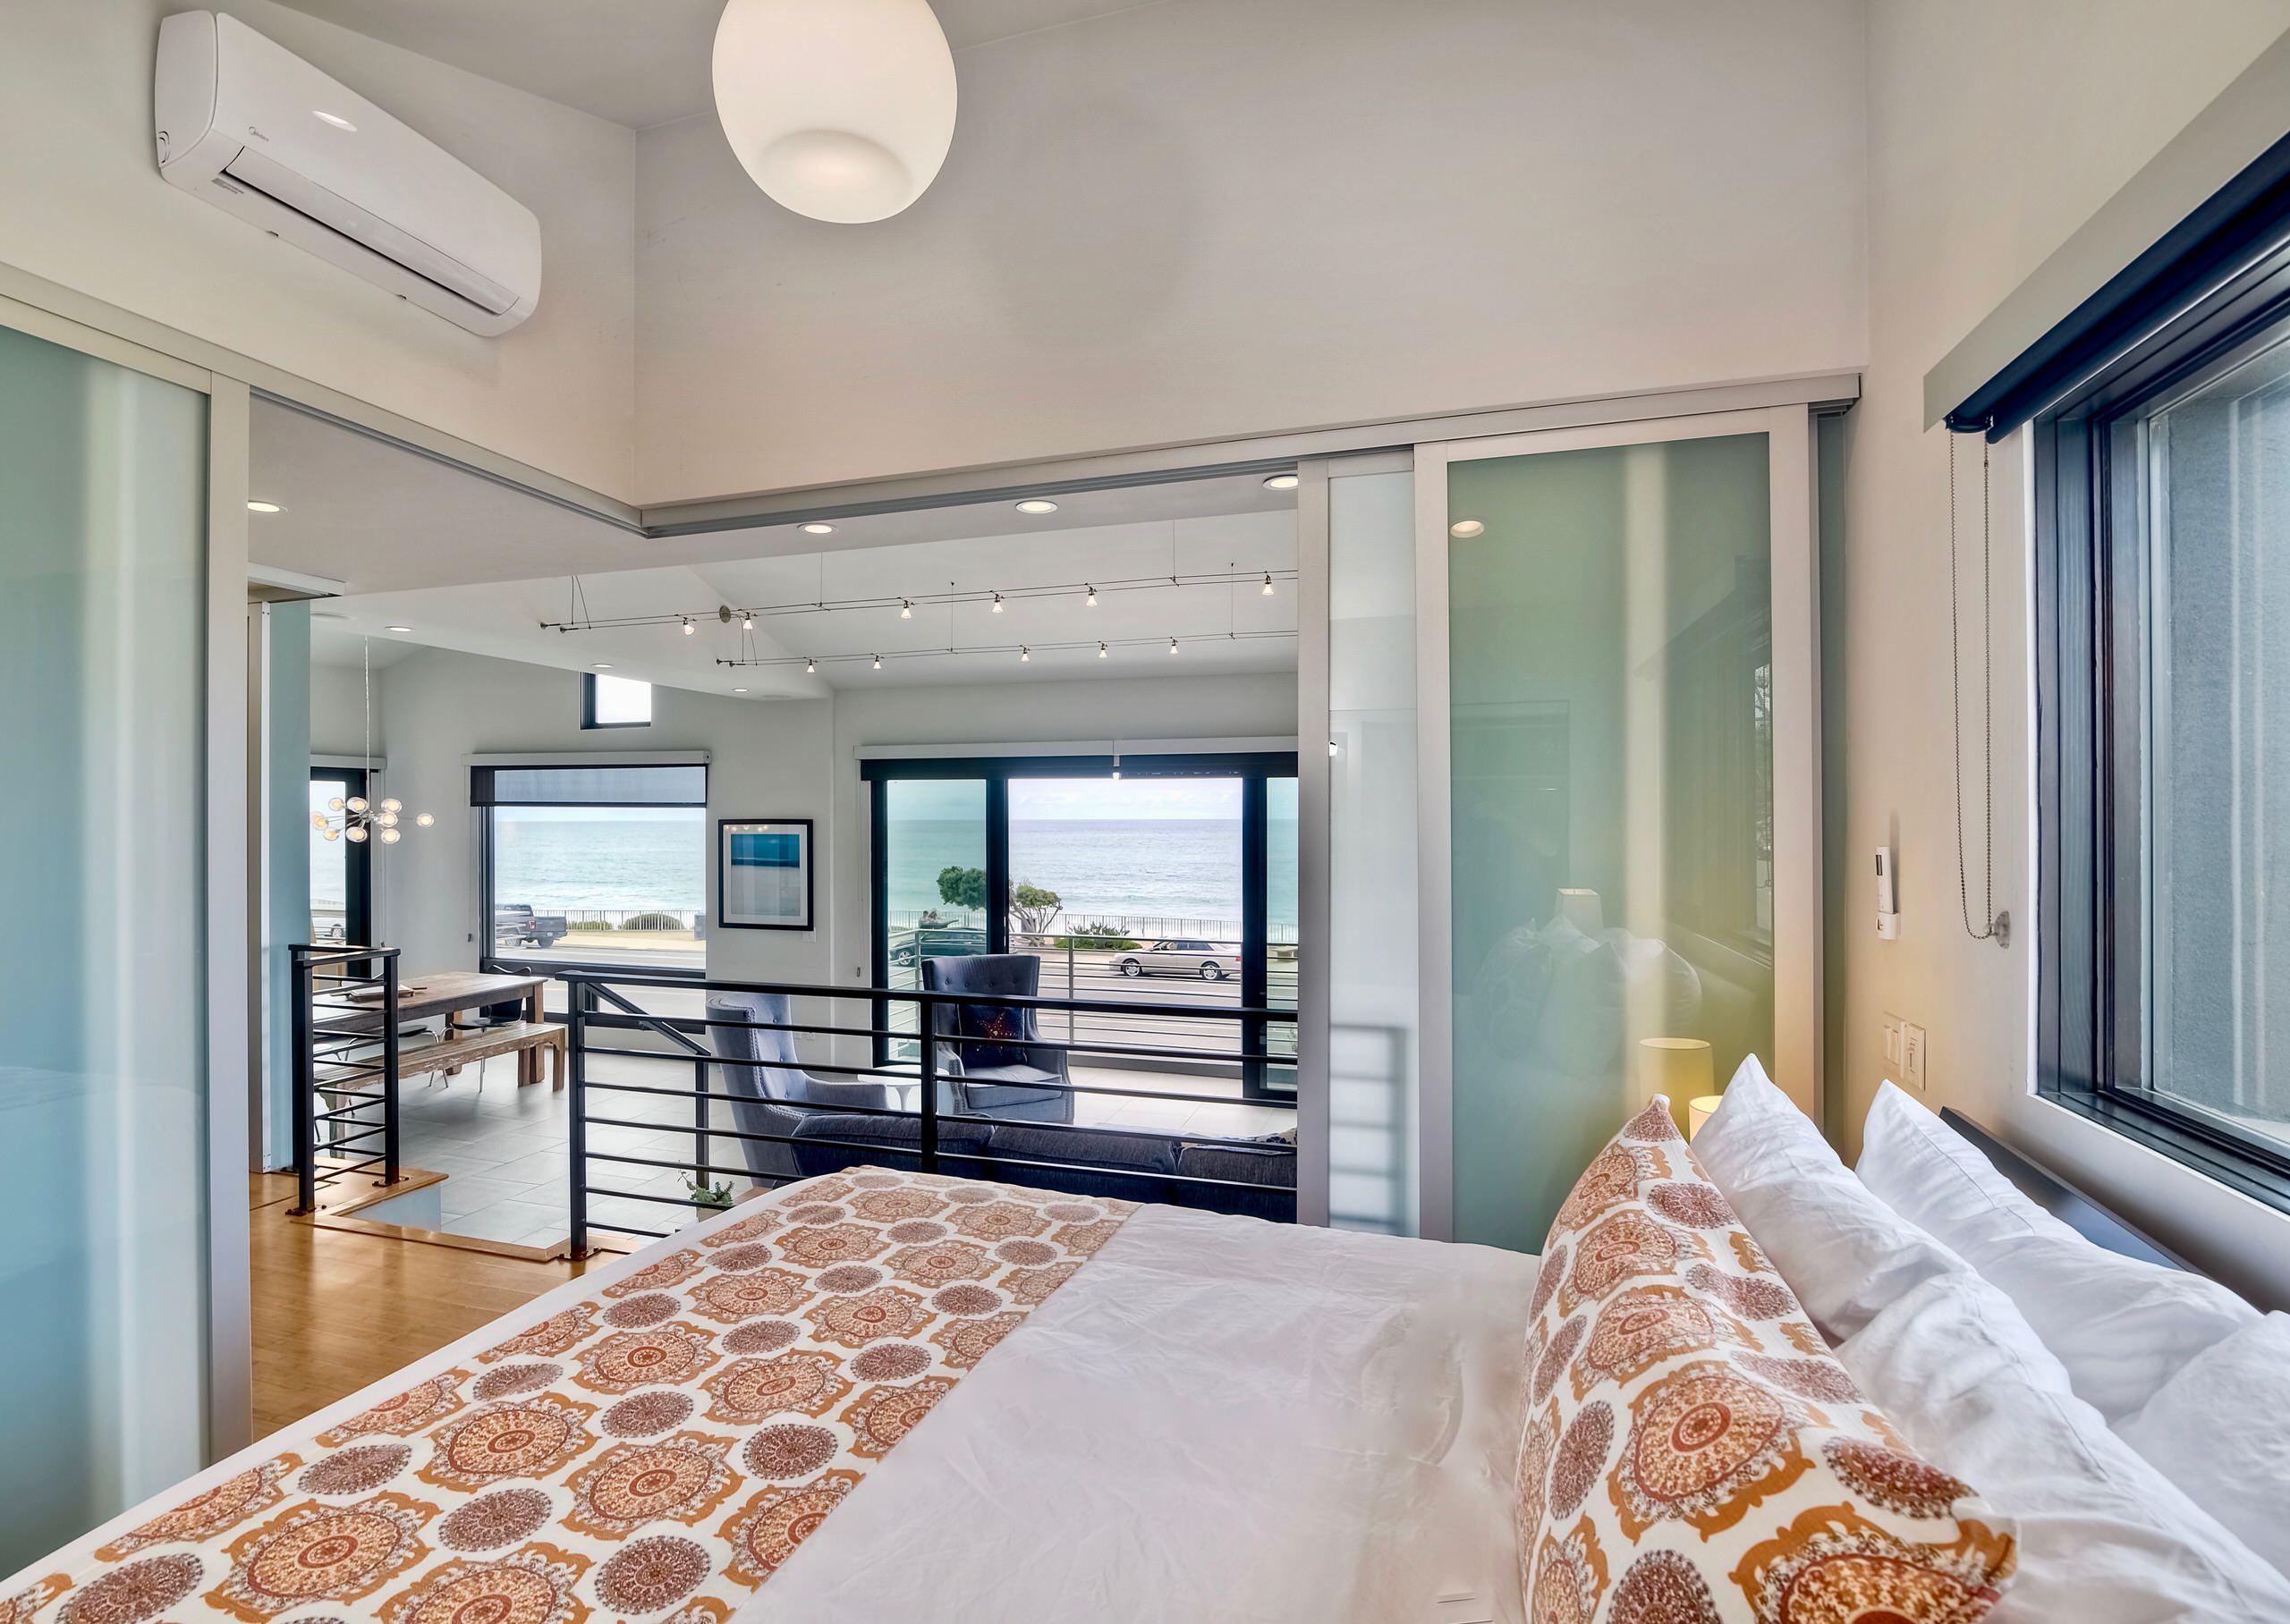 Two Unit Ocean Vacation Rental